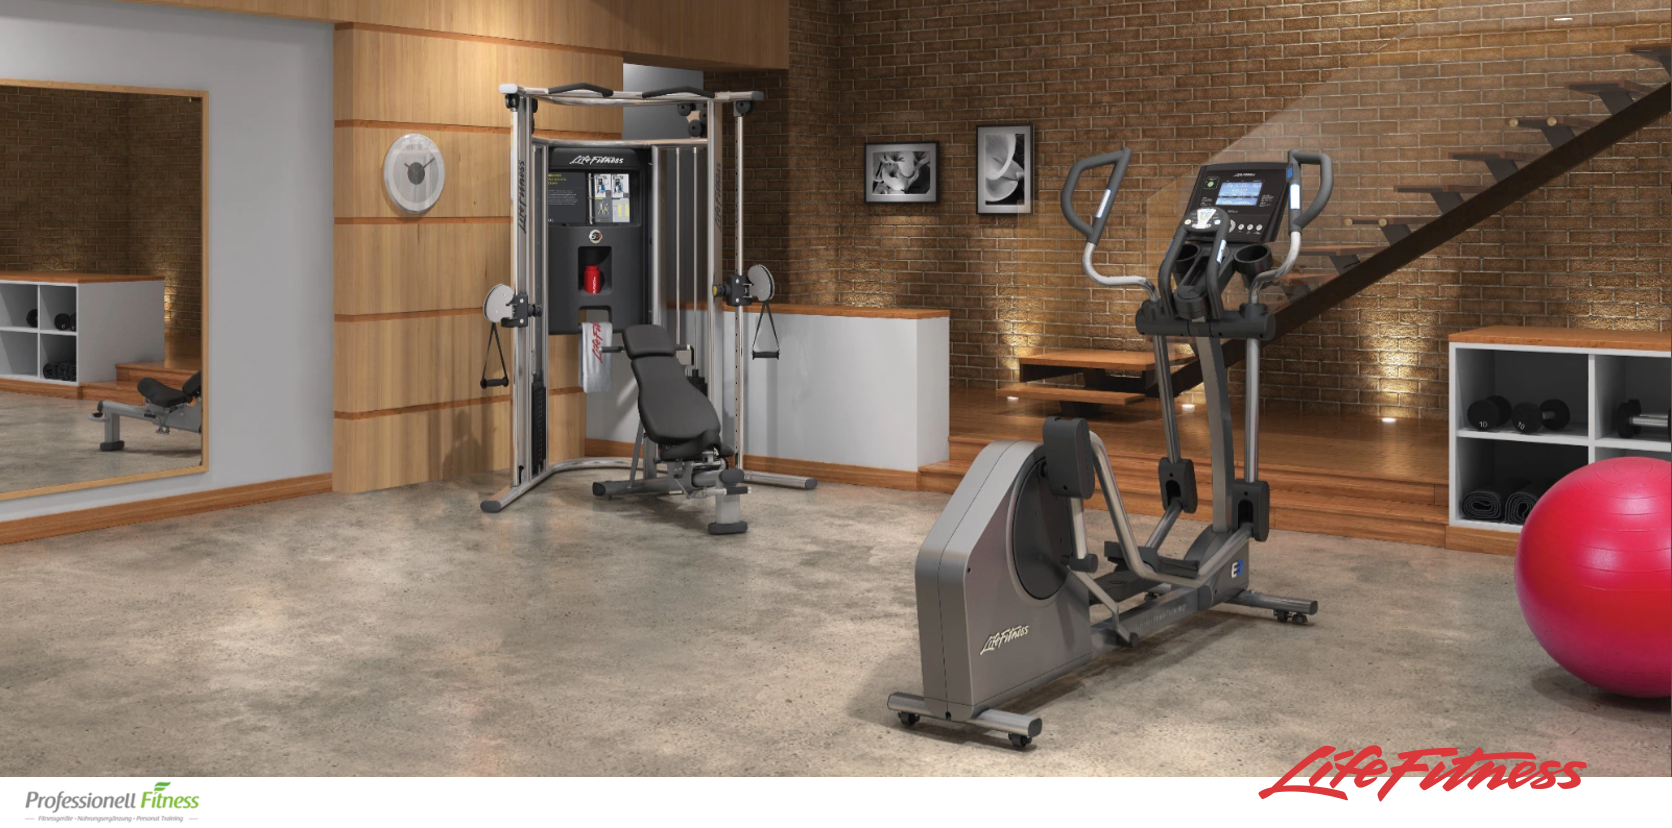 Raum-Life-Fitness-E3-und-G7-kraftstation